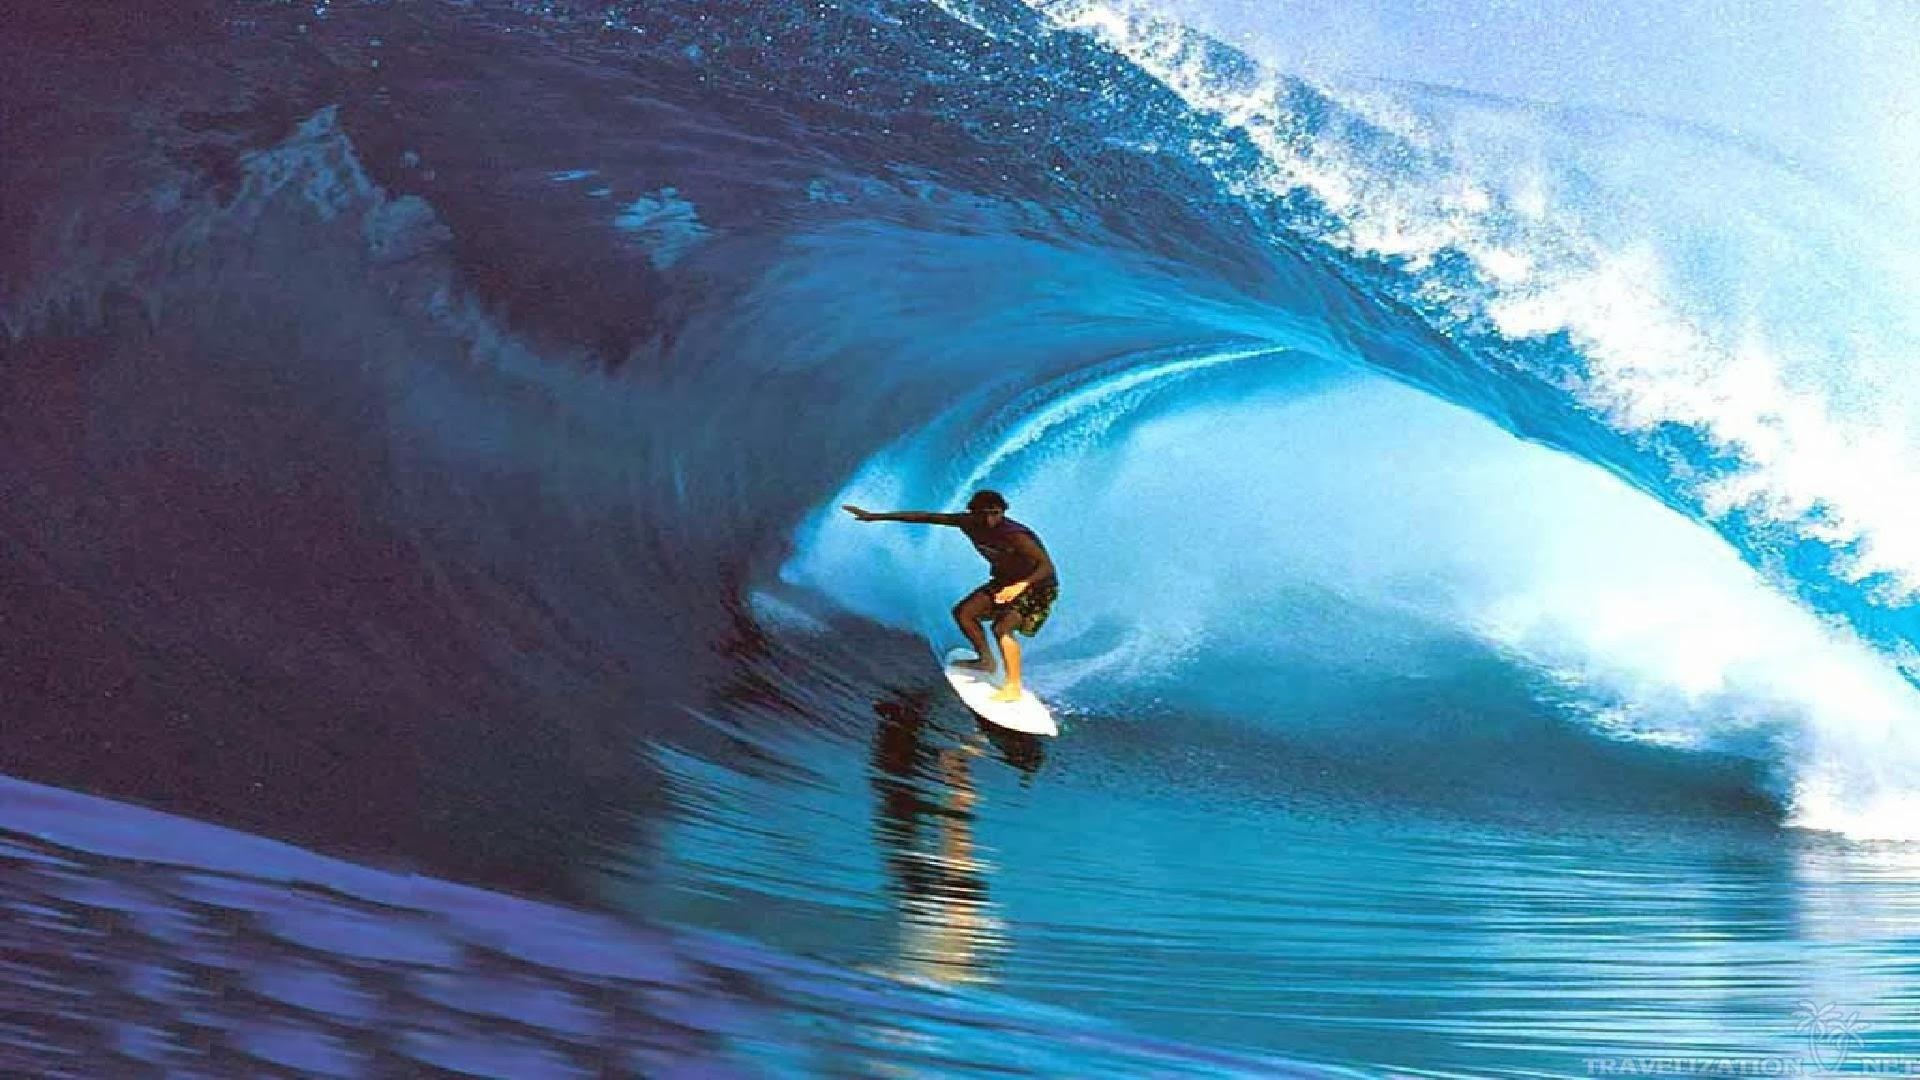 Top Cruiser Longboards Wallpapers